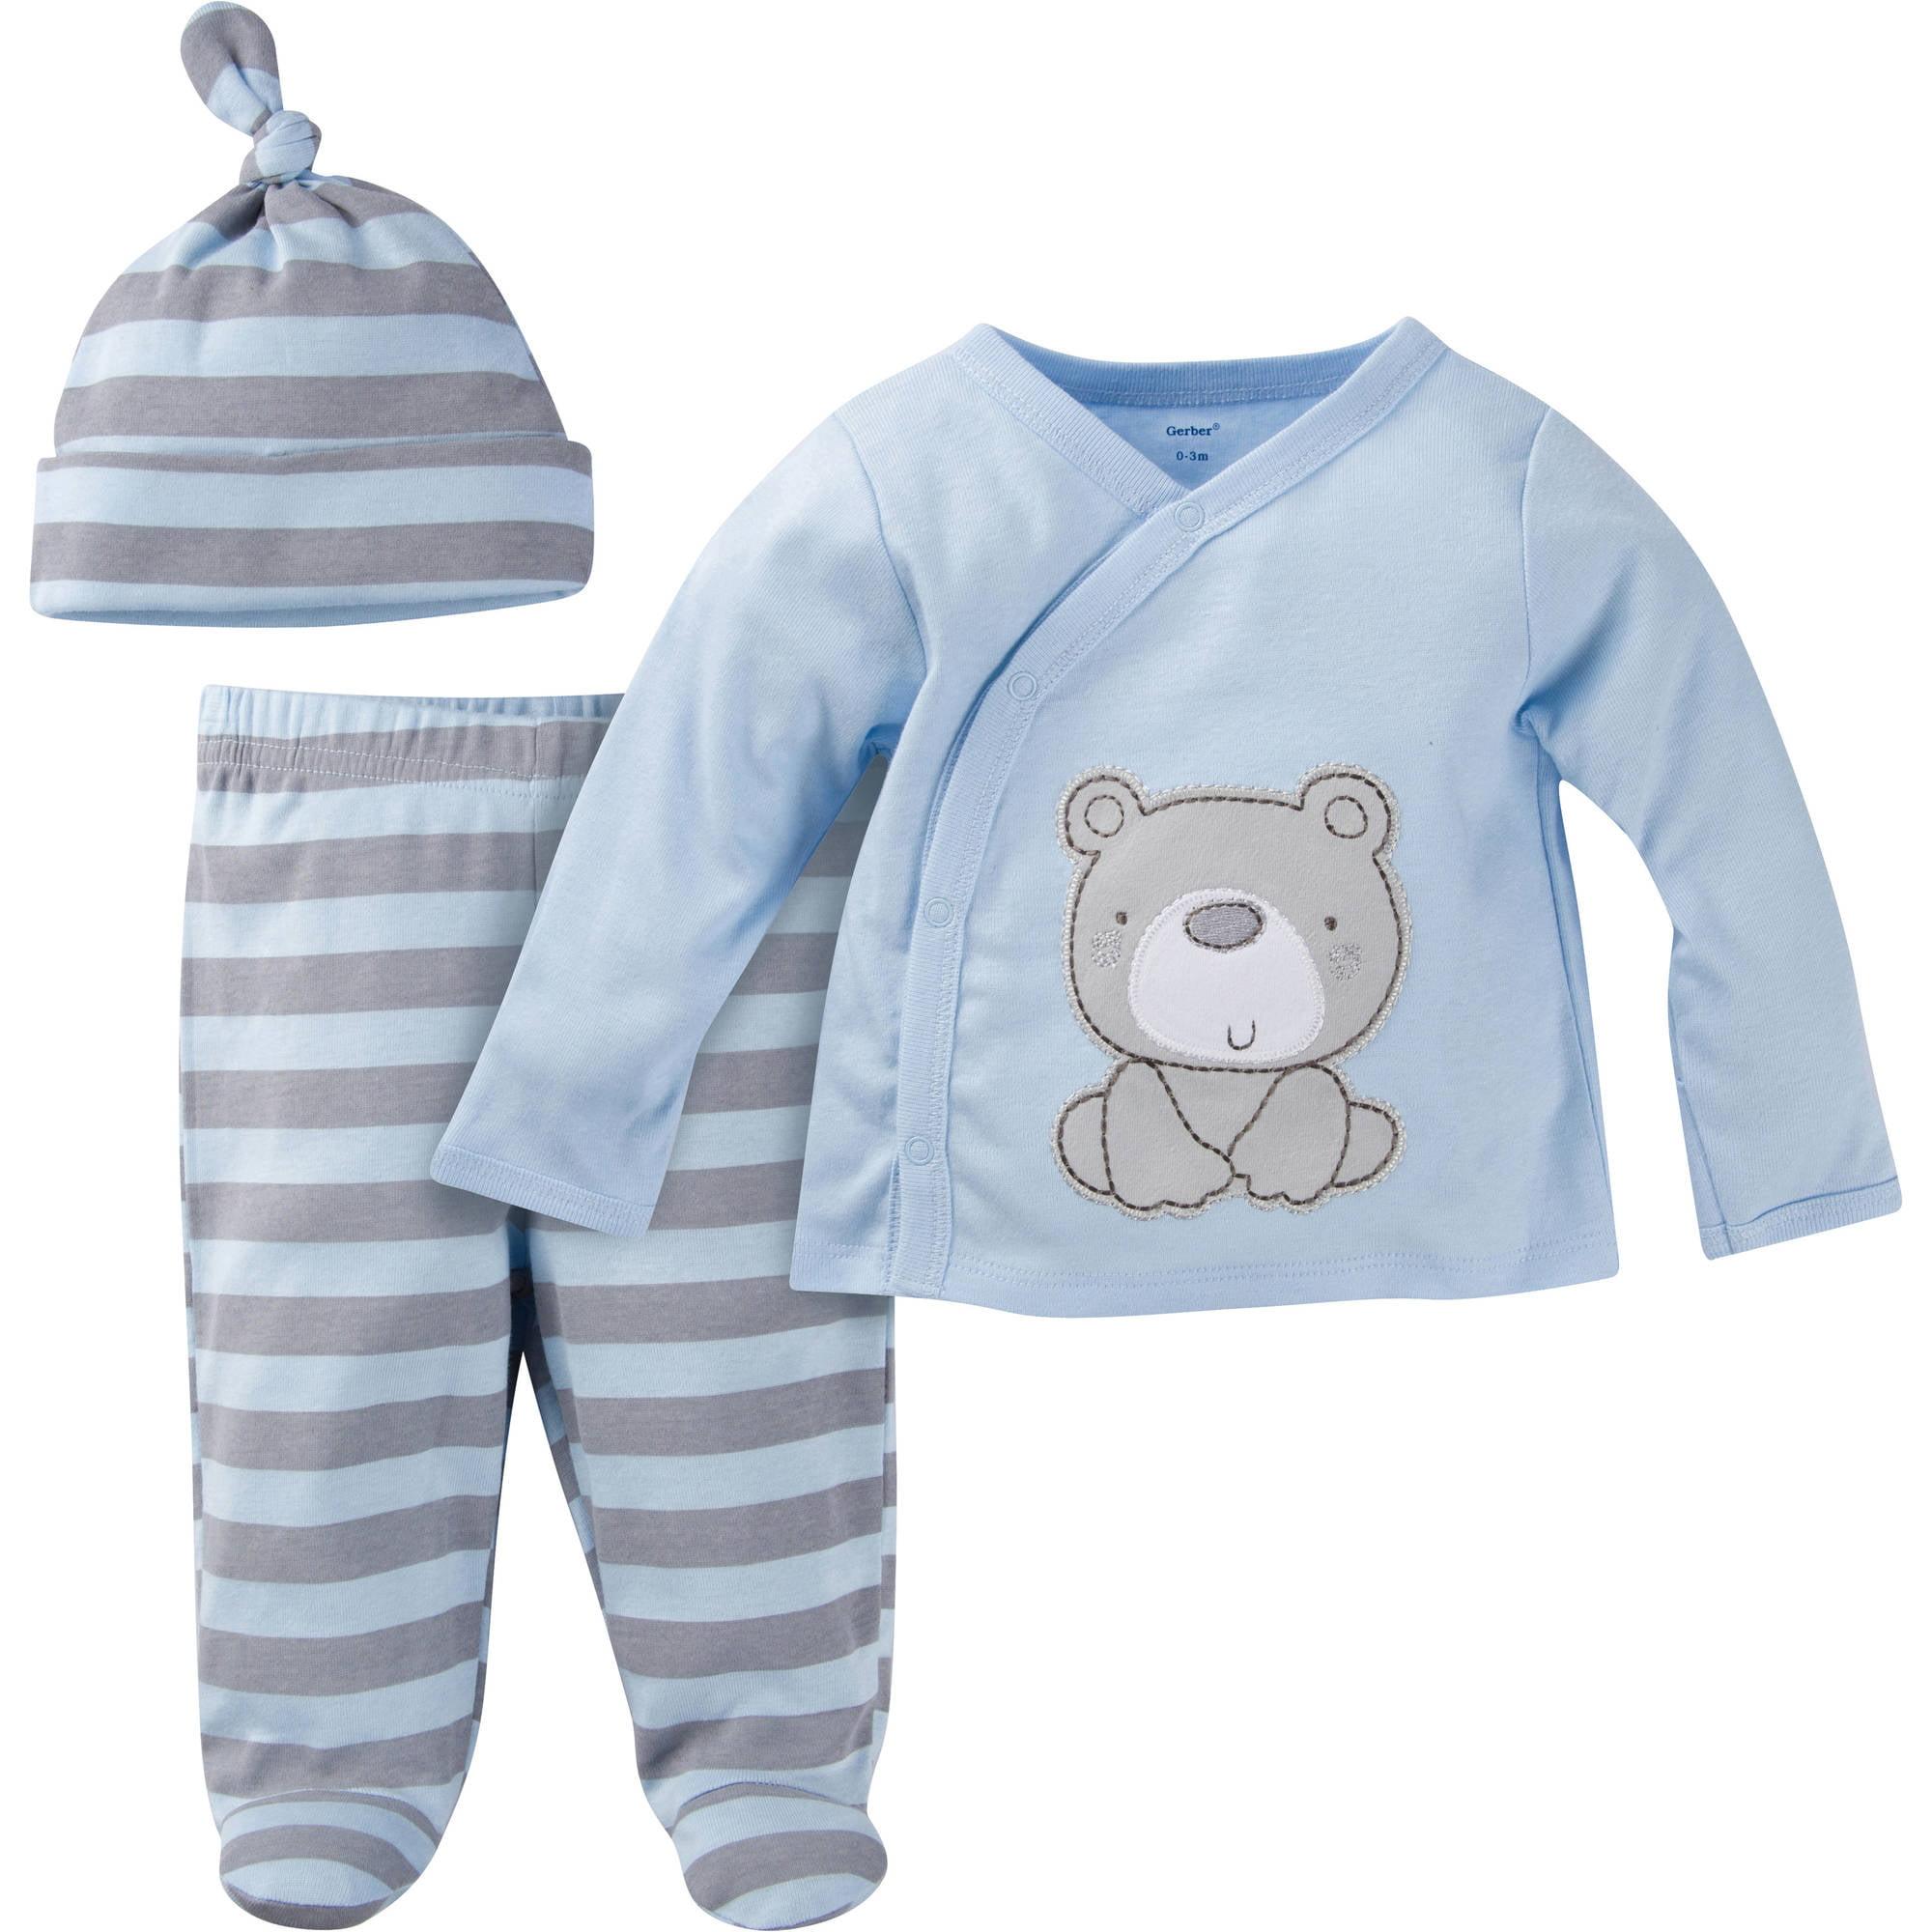 Gerber Newborn Baby Boy Take Me Home 3 Piece Layette Gift Set